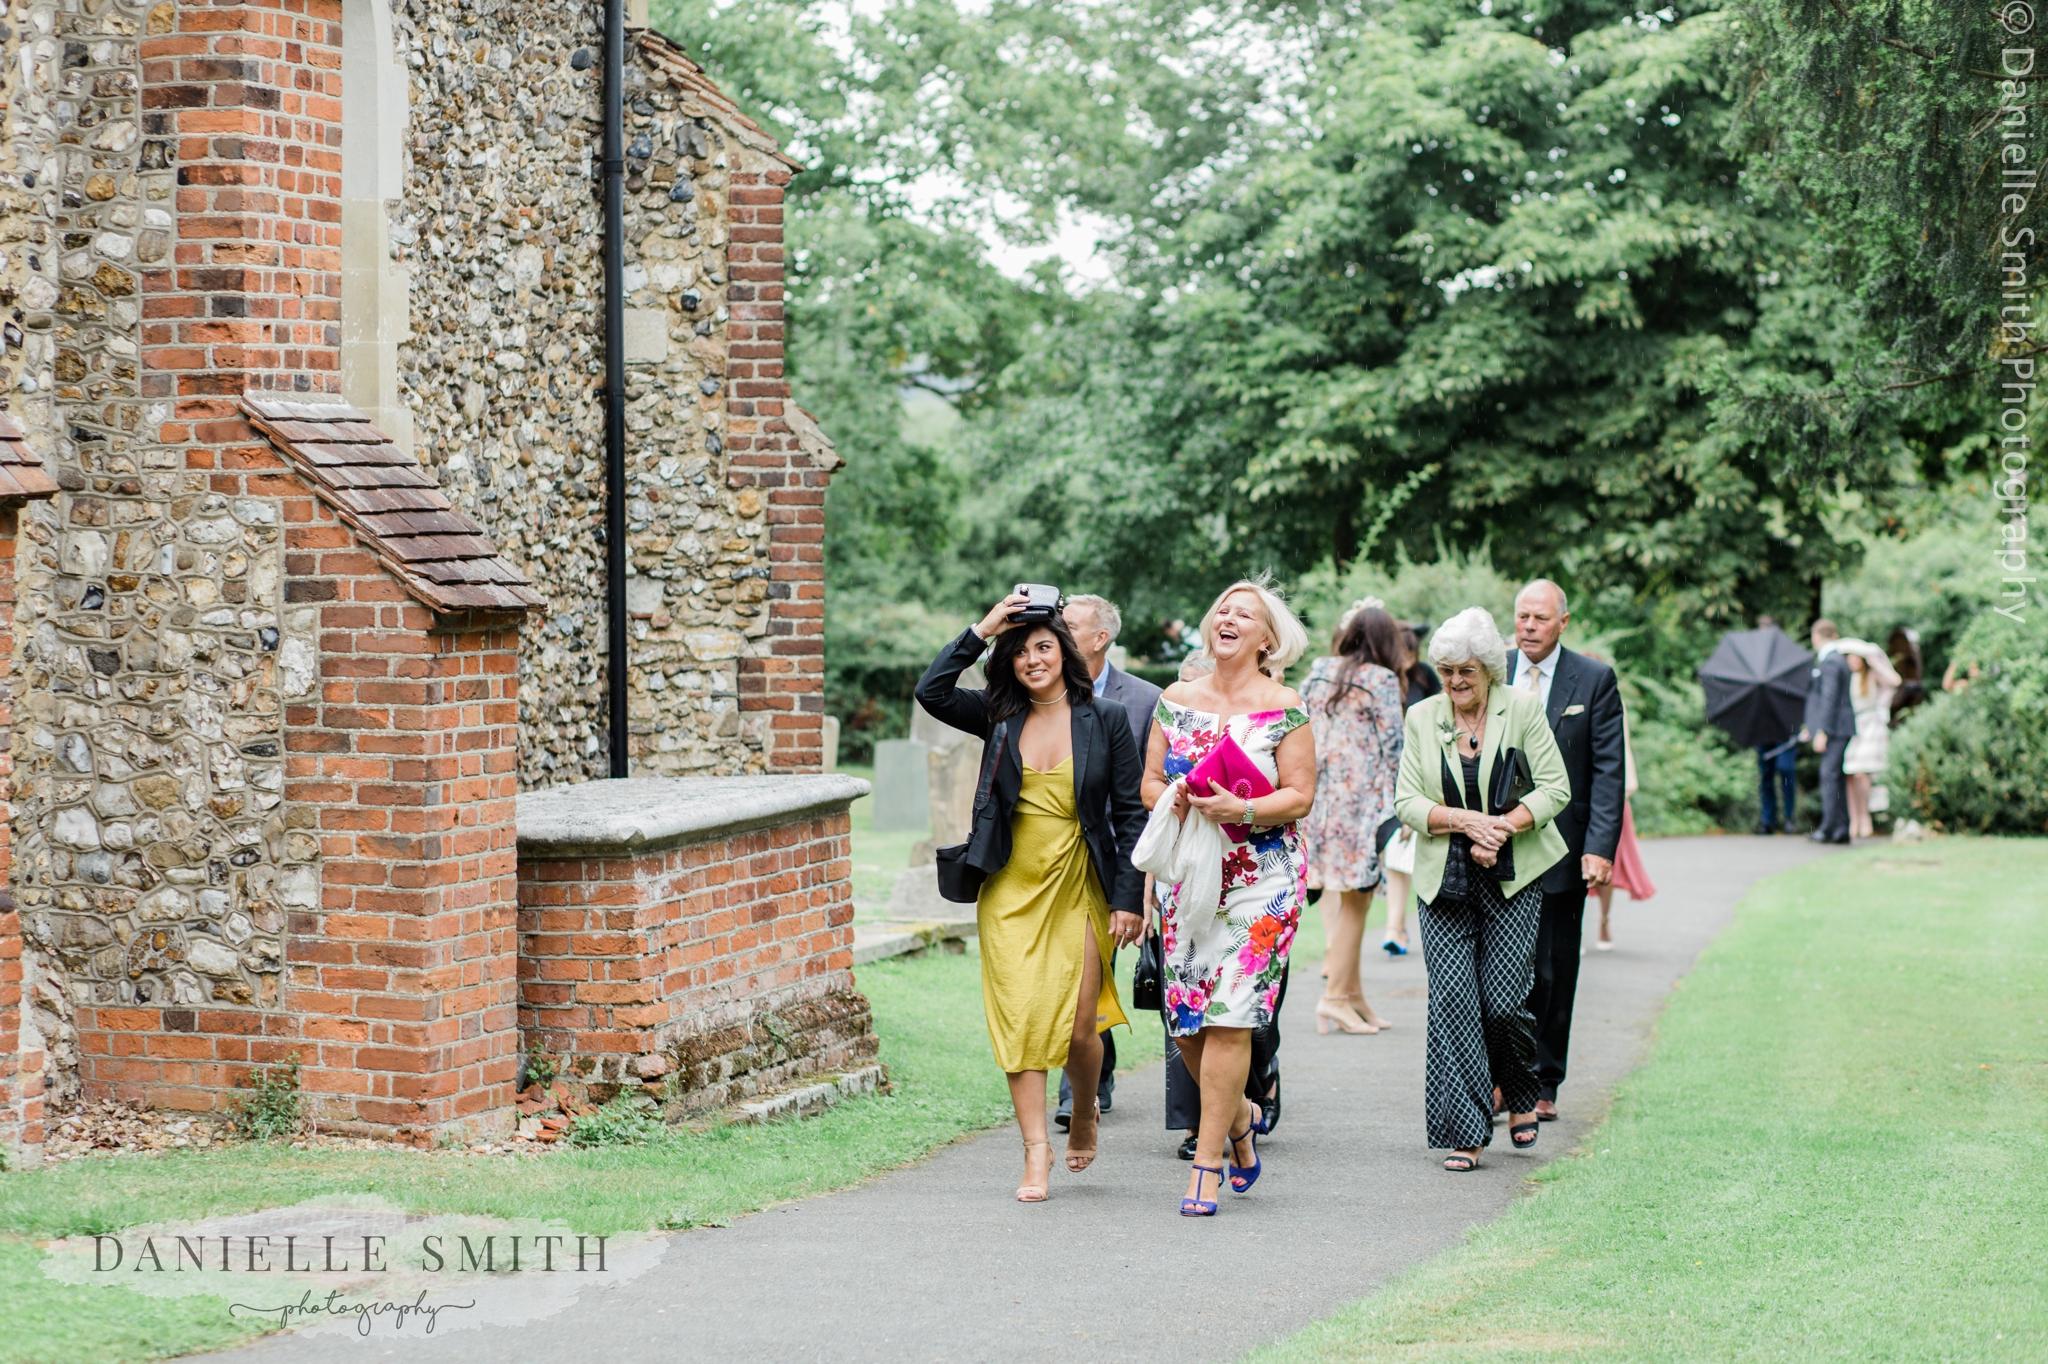 wedding guests walking to church as it starts raining